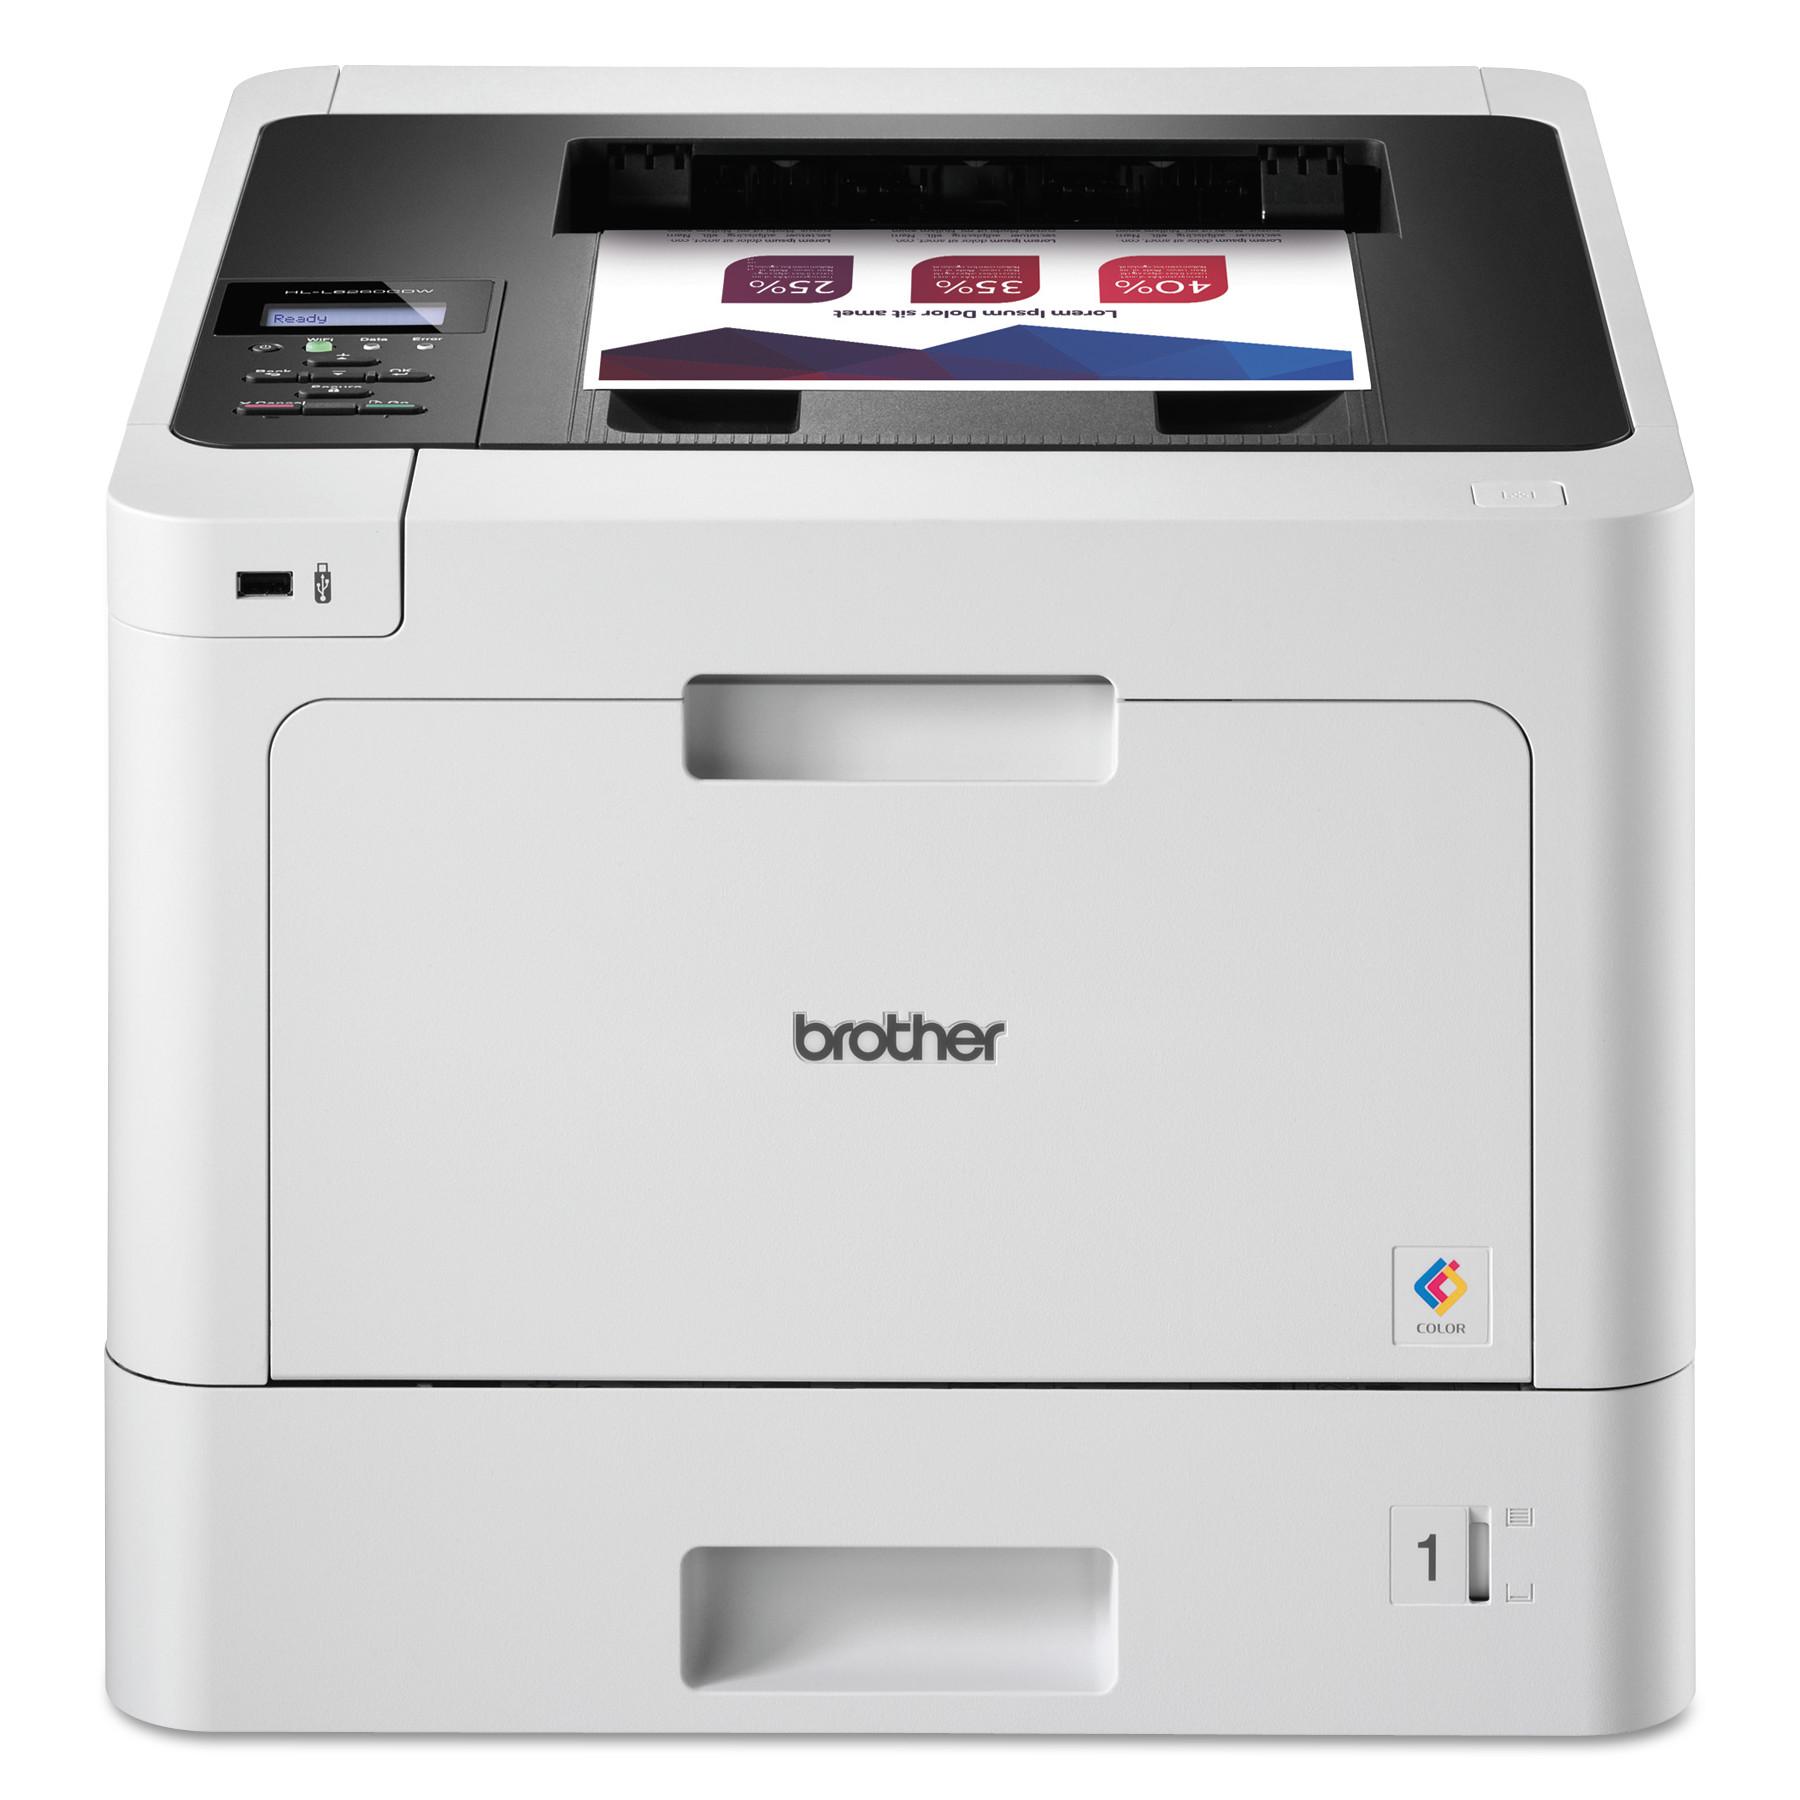 HL-L8260CDW Business Color Wireless Laser Printer, Duplex Printing